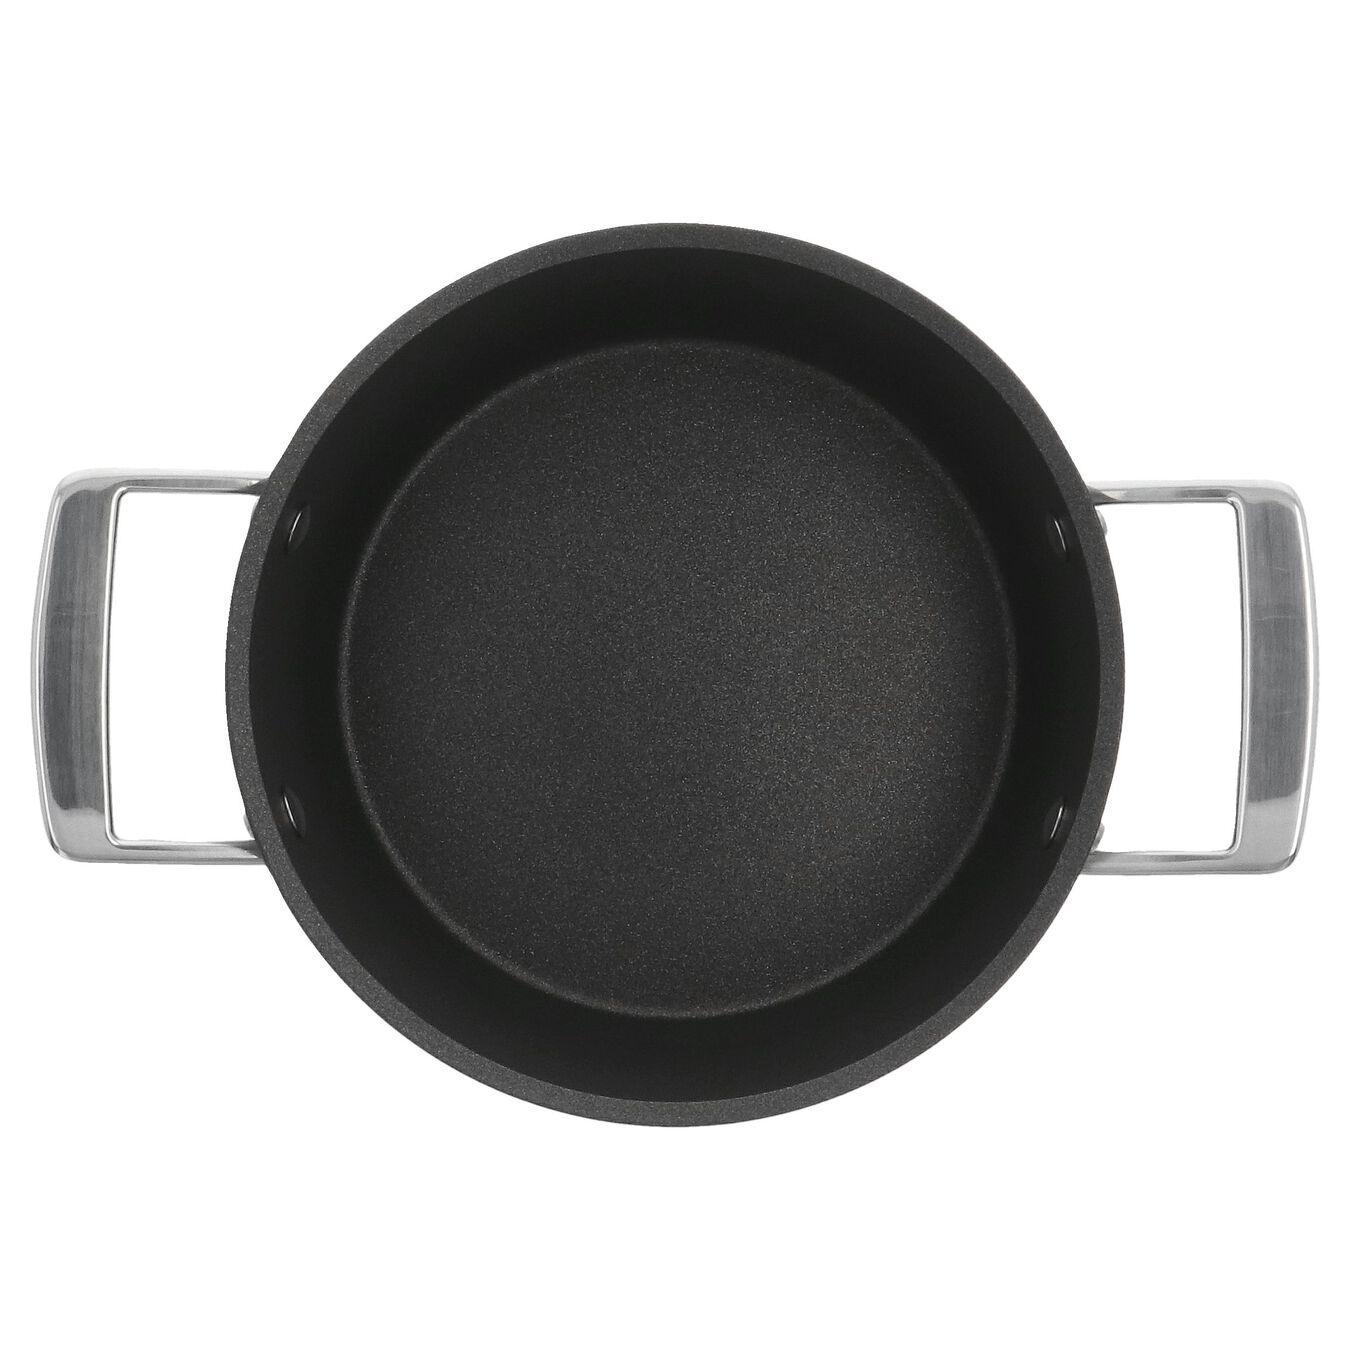 Kookpot met deksel Duraslide Titanium 18 cm / 2 l,,large 5